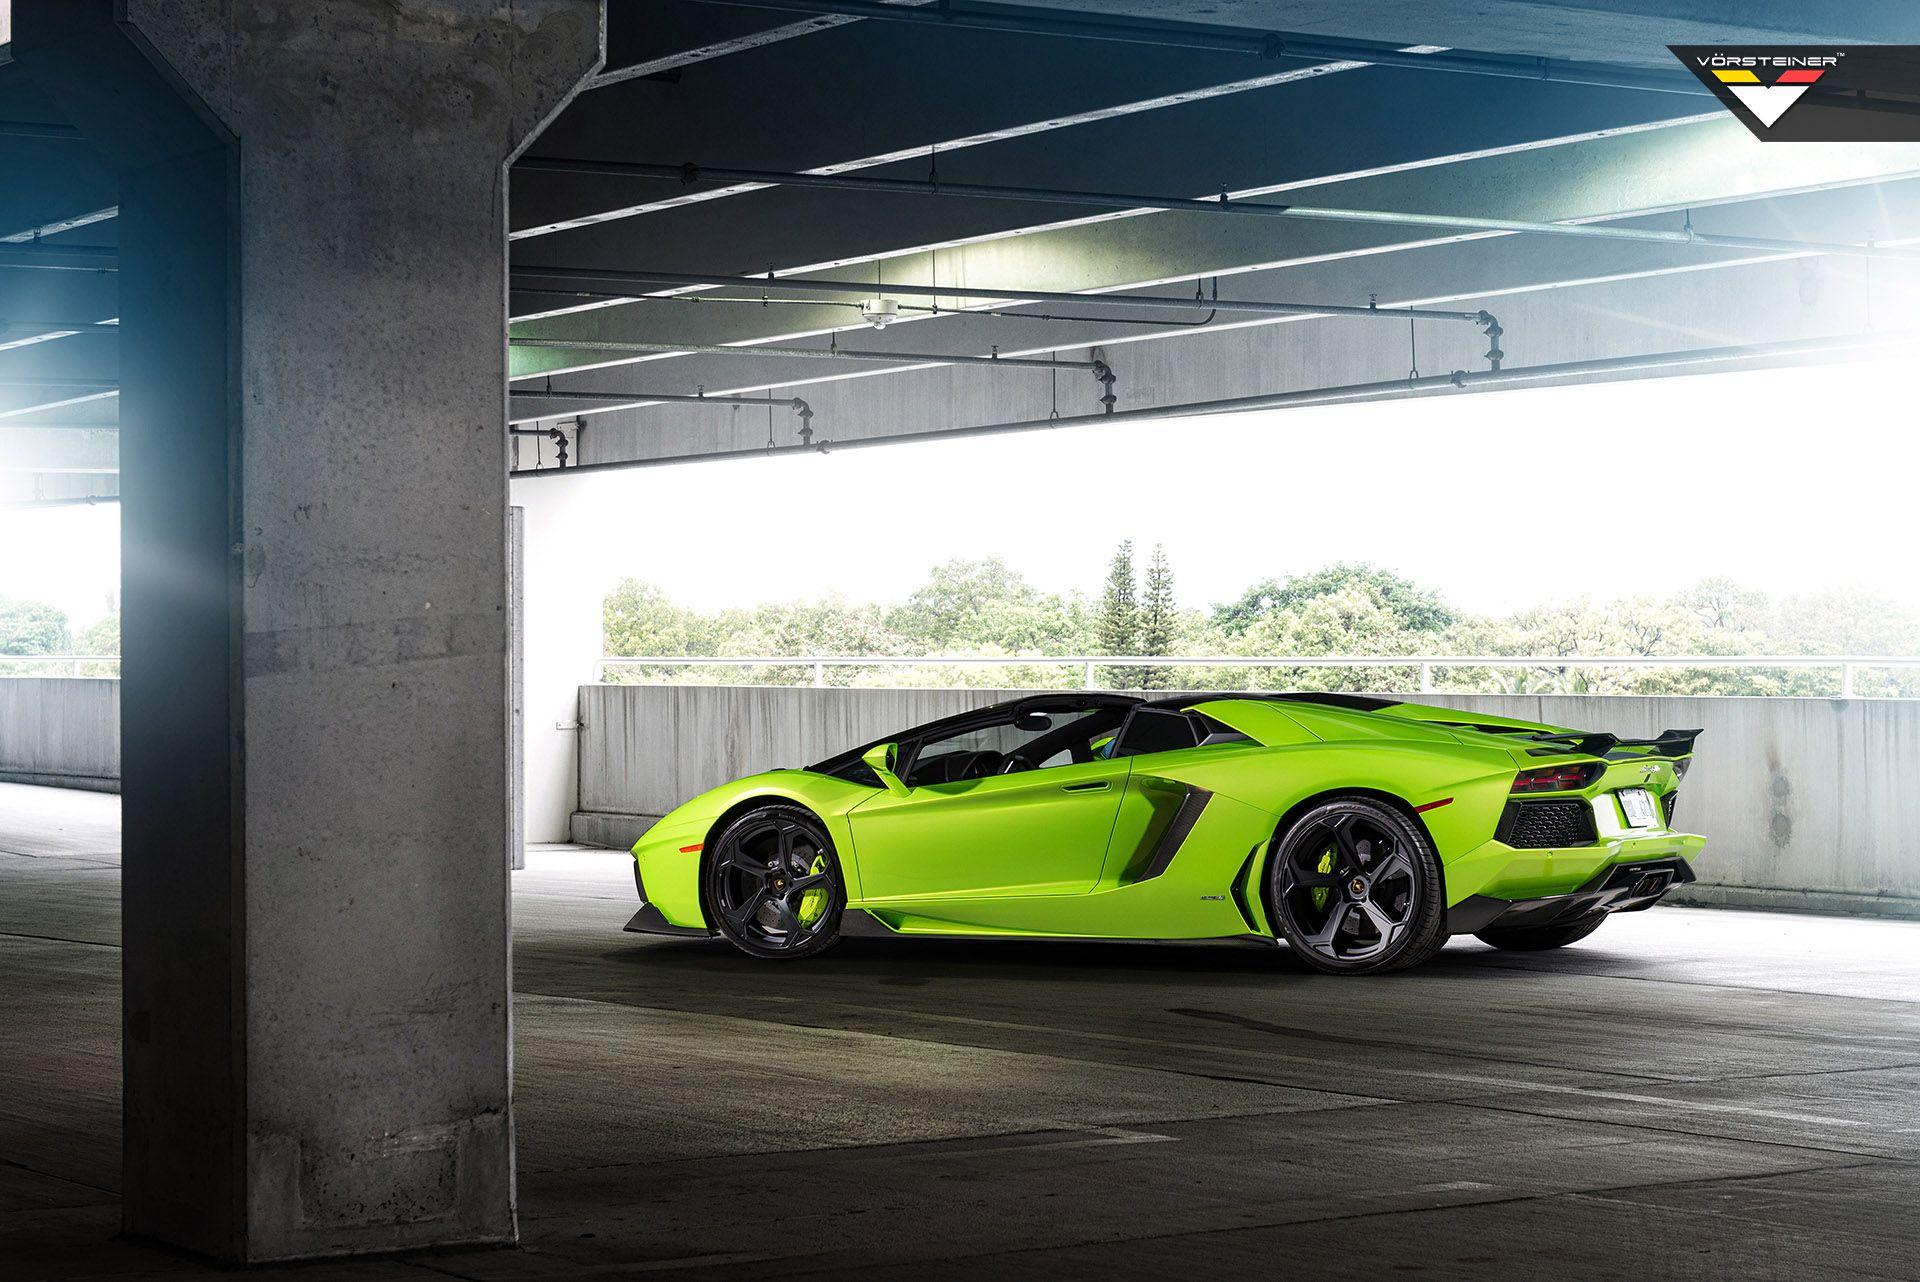 Lamborghini Hulk Aventador V Lp 740 By Vorsteiner Le Tuner